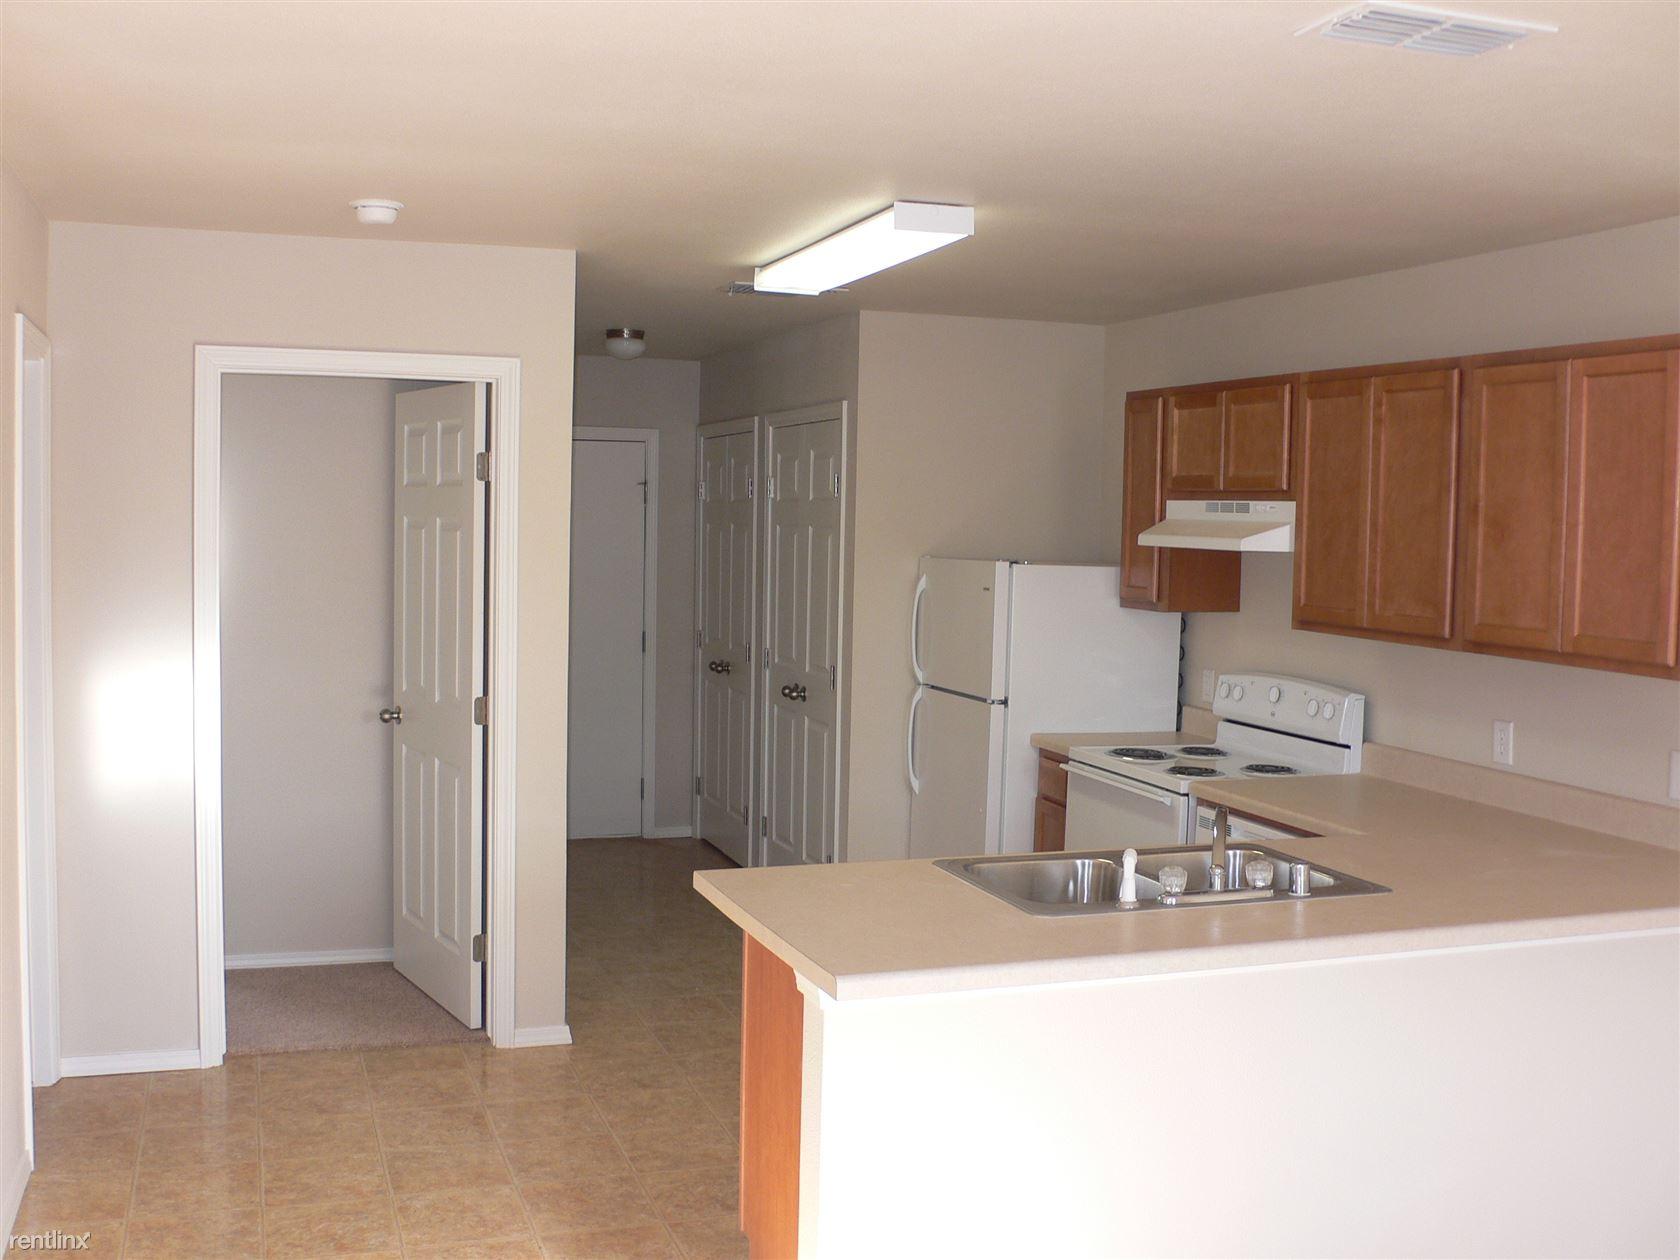 3419 N Dal Paso St, Hobbs, NM - $895